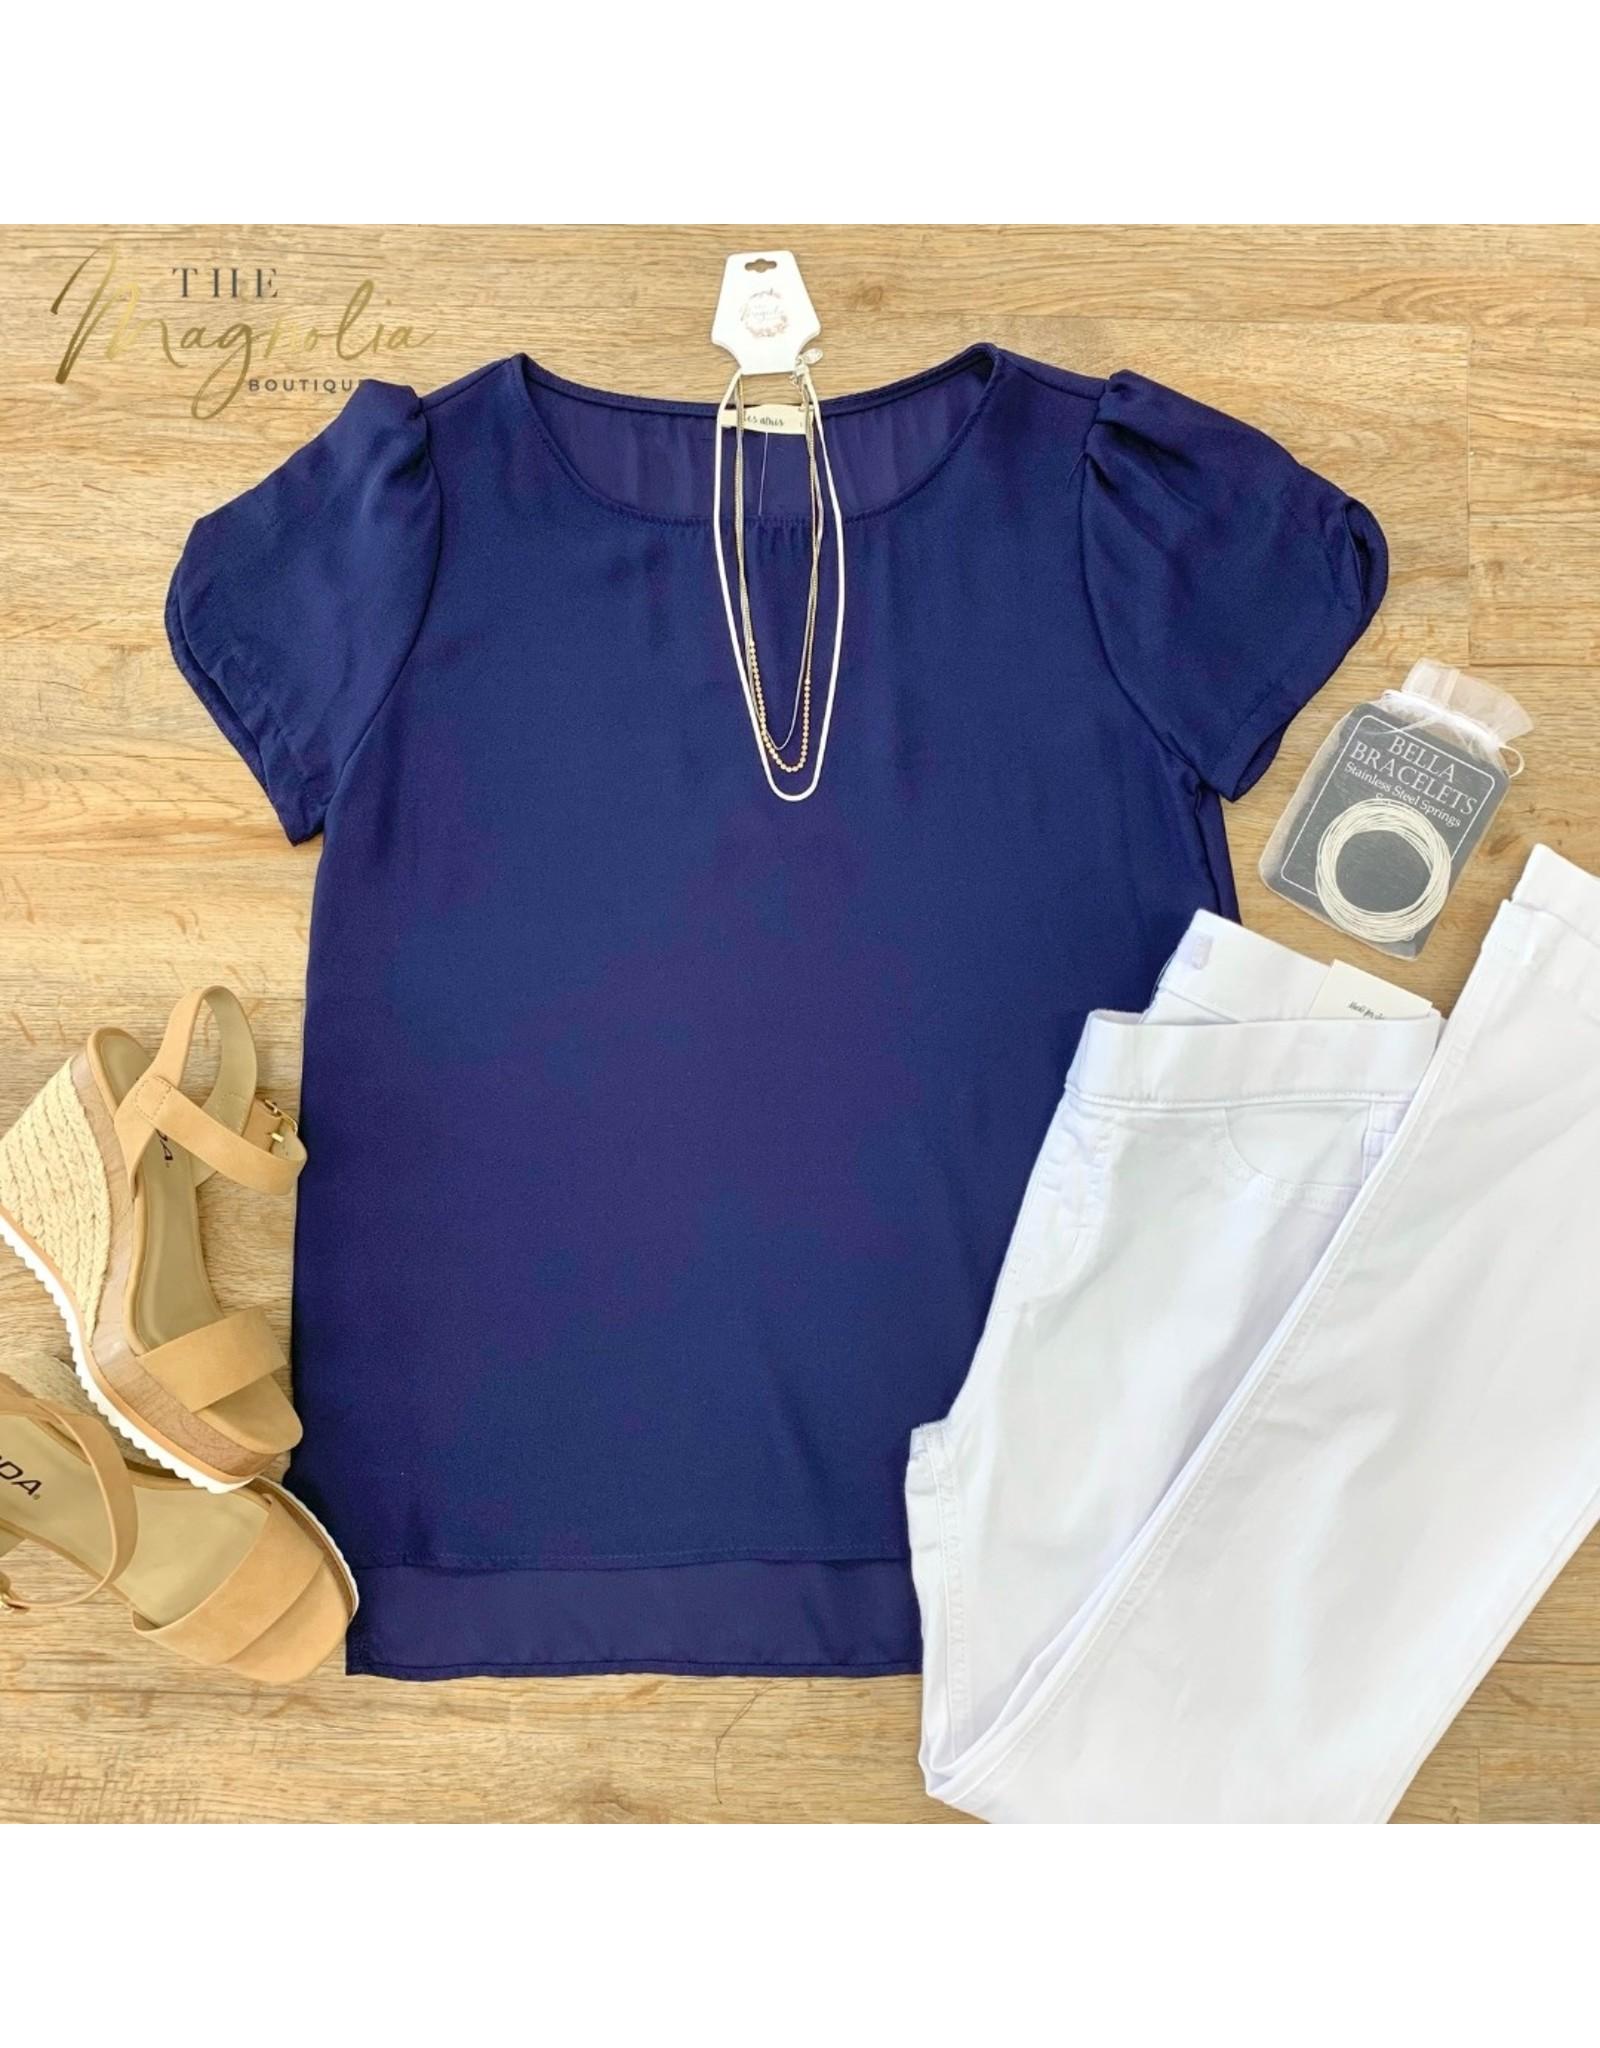 Navy Short Sleeve Top w/ Sleeve Detail